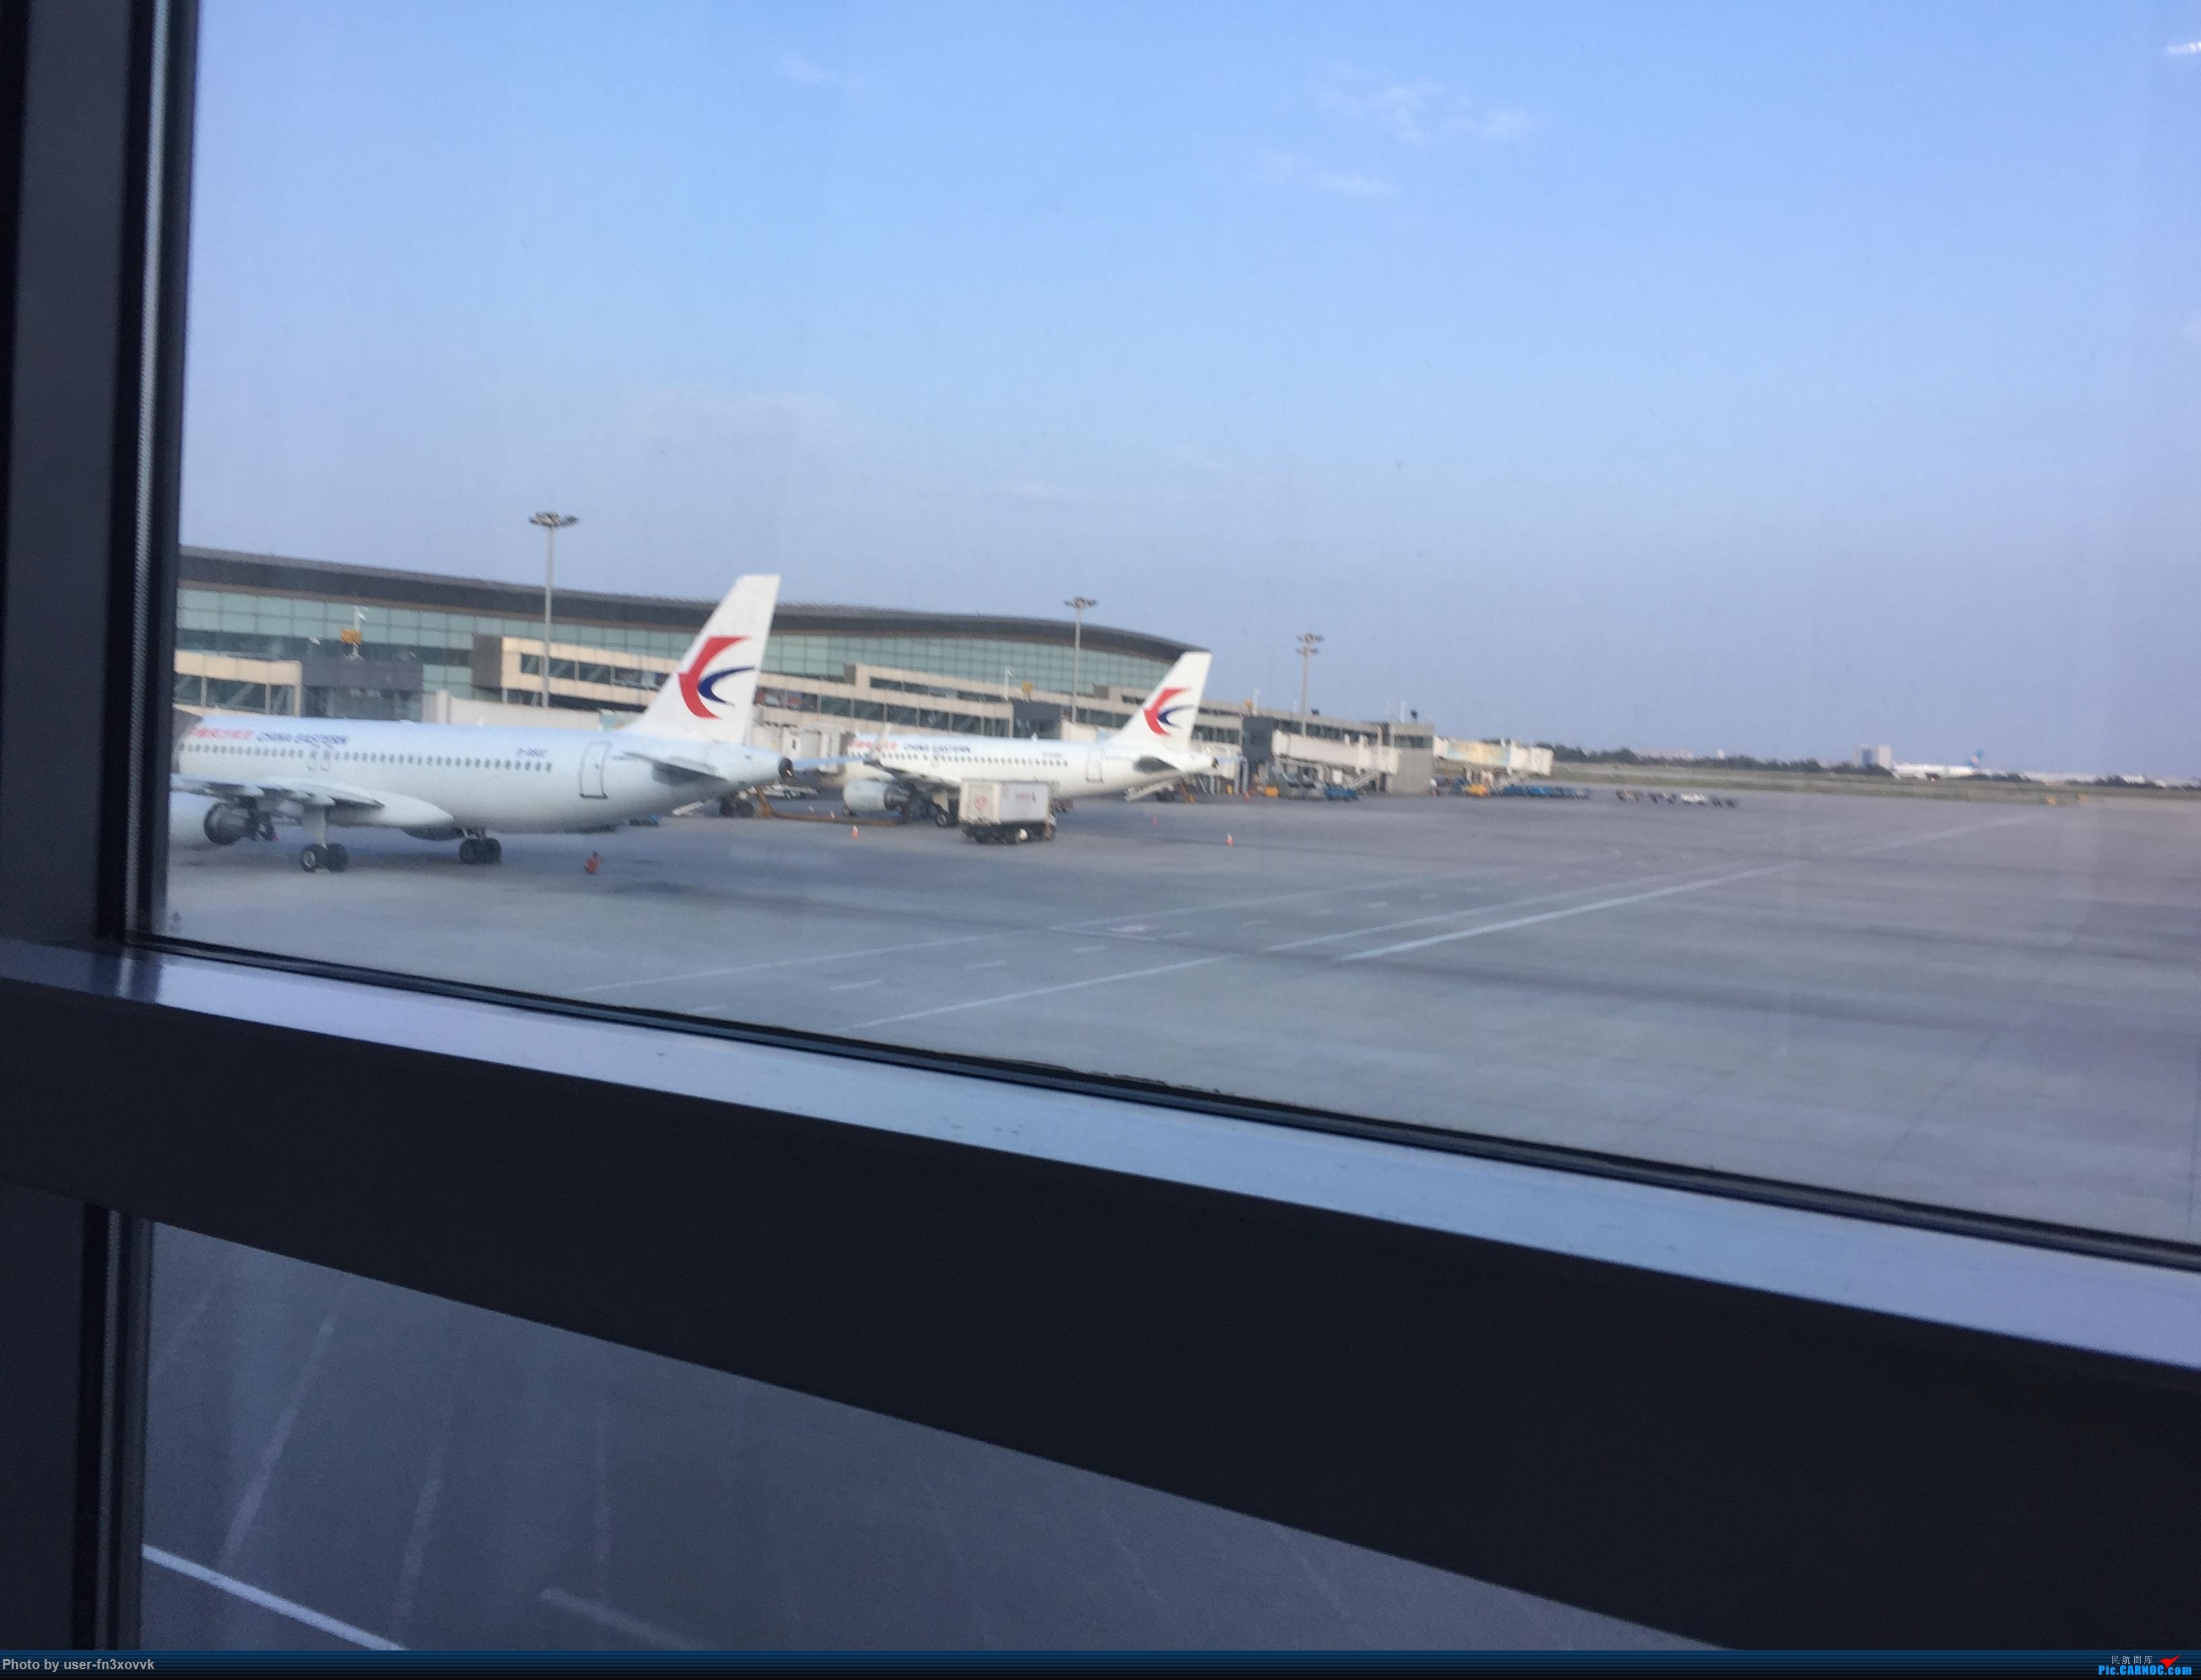 Re:[原创]【user-fn3xowk的游记】第二季第一集 MU2112&MU9641解锁新机型A319及深夜航班(续集) AIRBUS A320